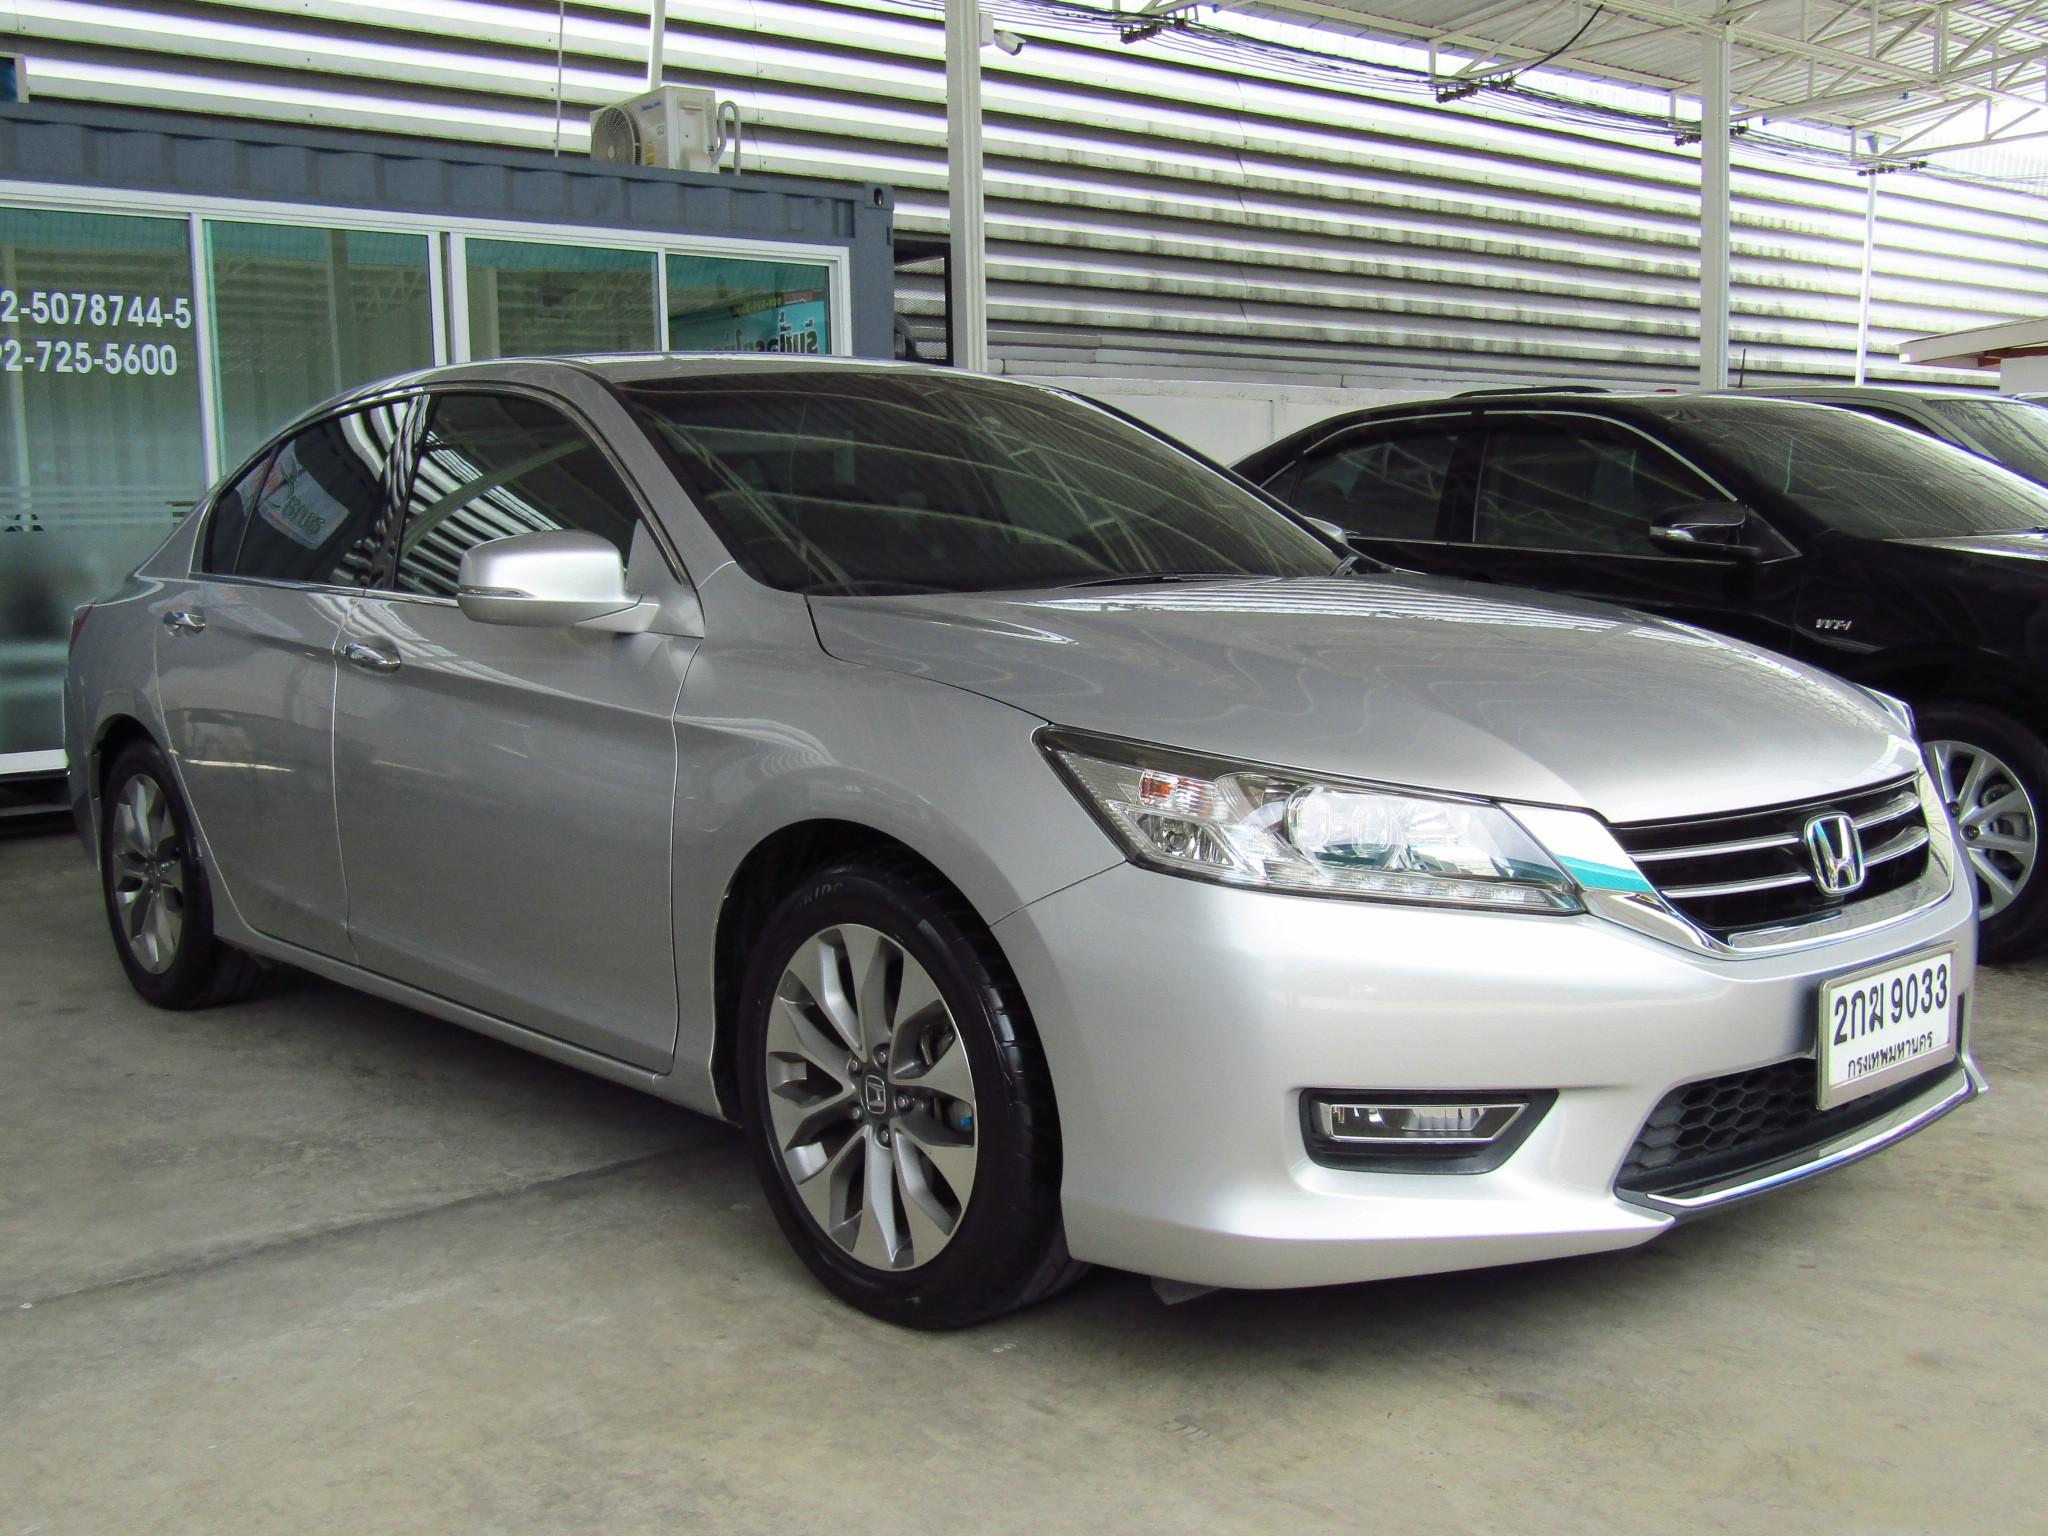 Honda Accord (101,xxx) EL  2.4 AT Sedan (ผ่อน 16,559 บาท 48เดือน)